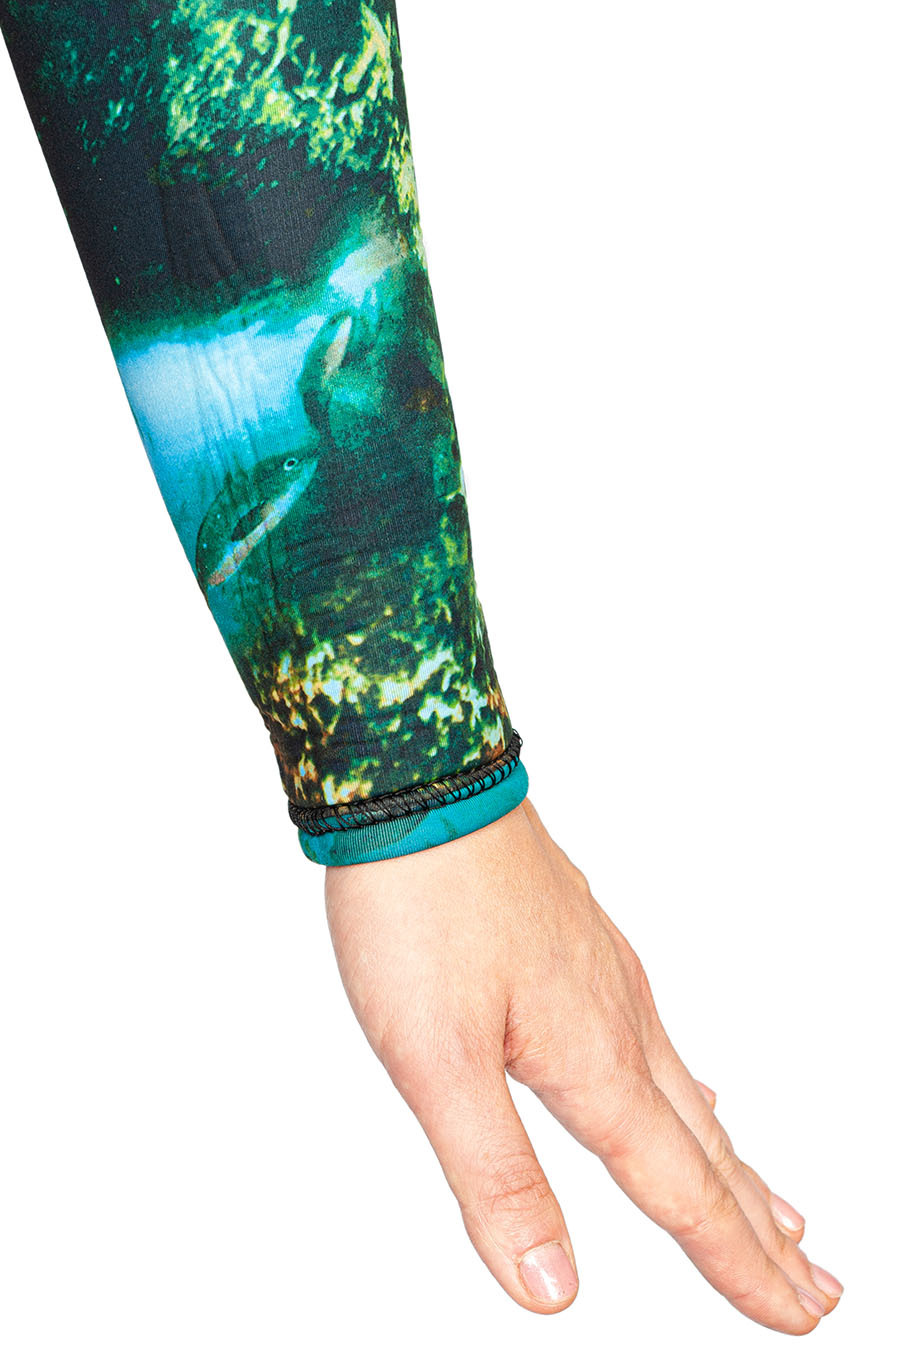 Гидрокостюм женский Salvimar Seawalker Lady 5,5 мм